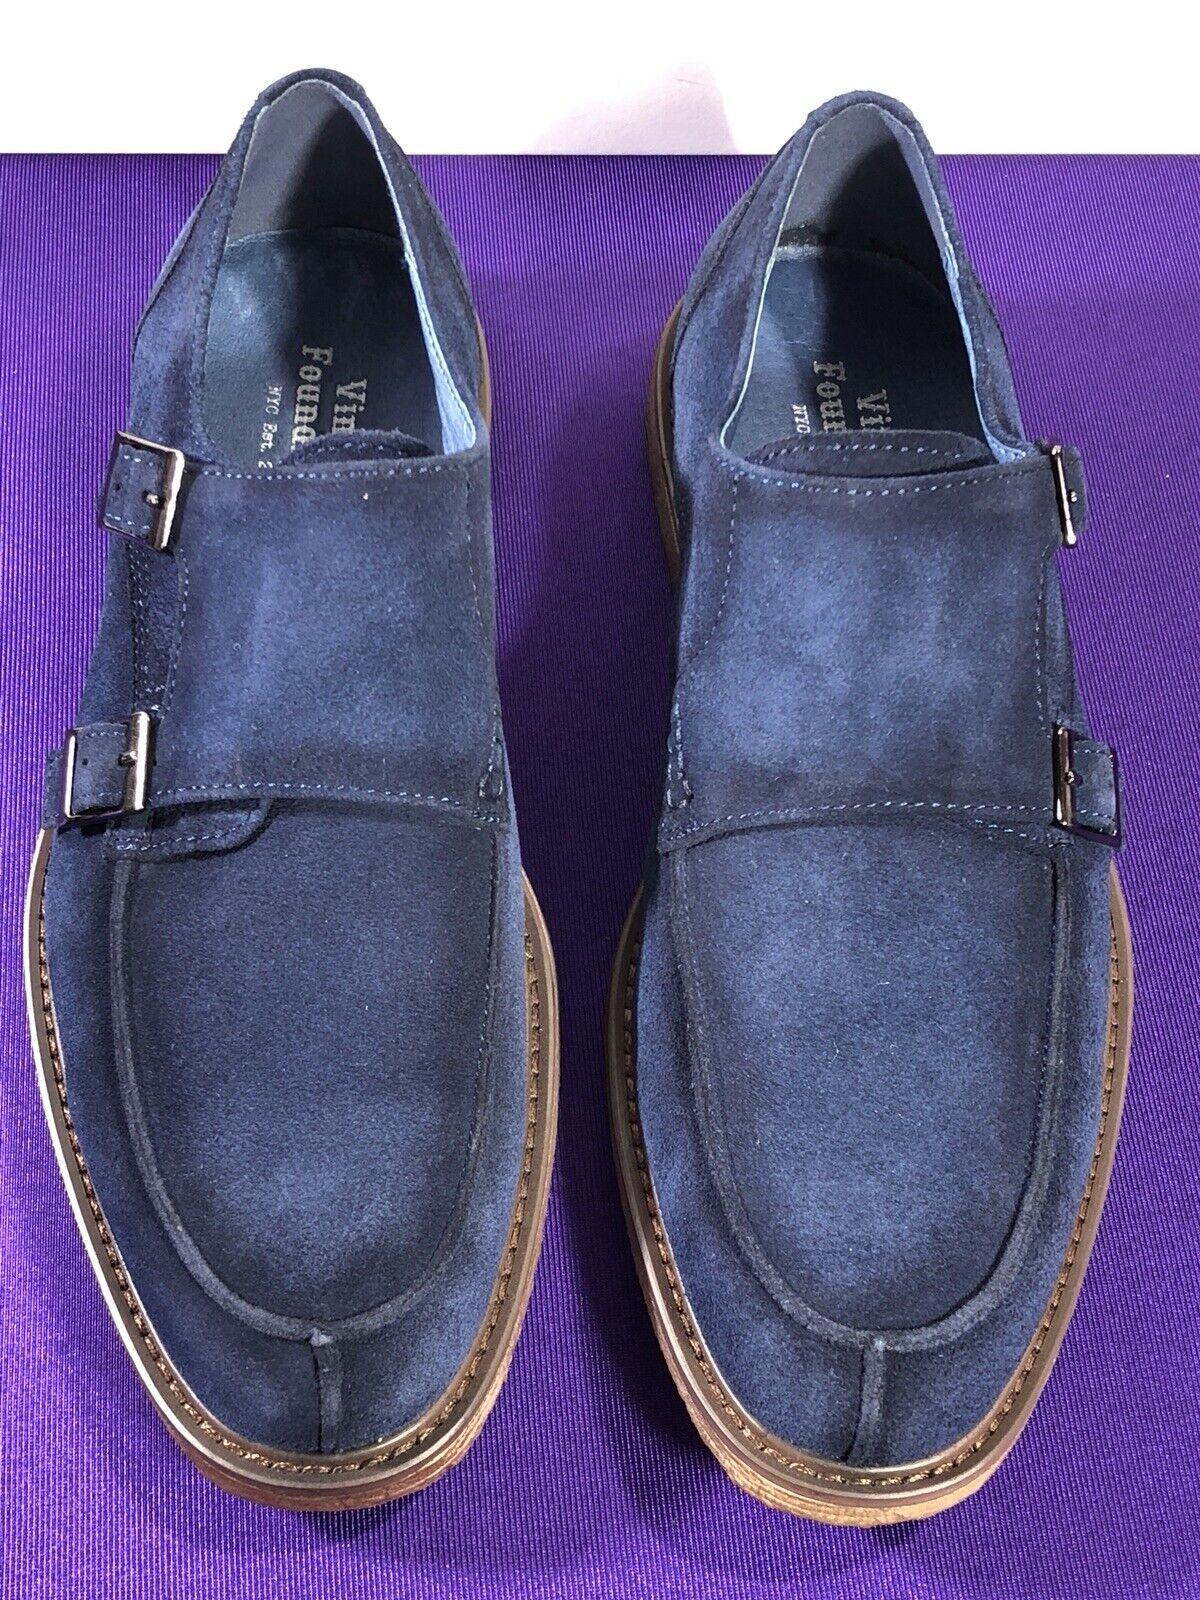 Vintage Foundry Roebling Navy Mens shoes US Size 7   VF1010 SE MSRP